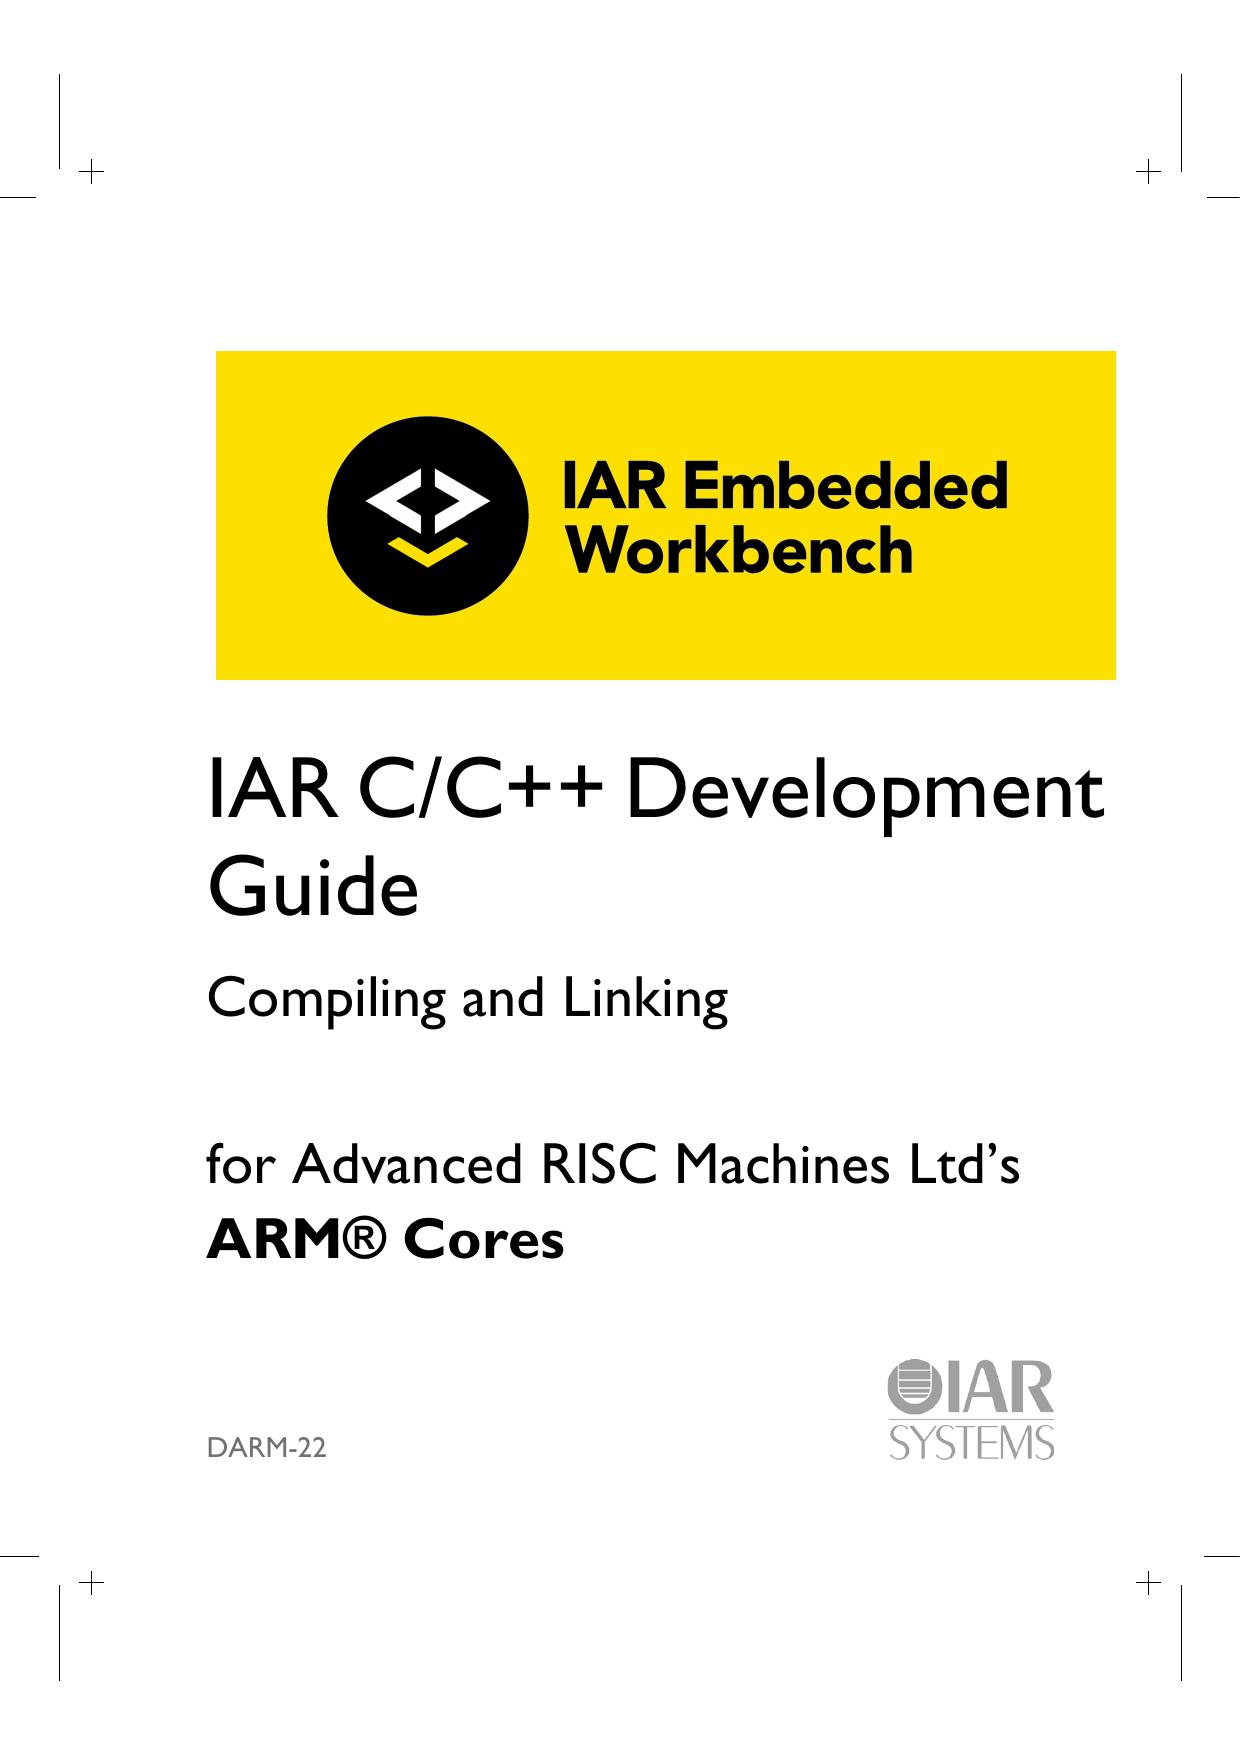 IAR C/C++ Development Guide - FTP Directory Listing